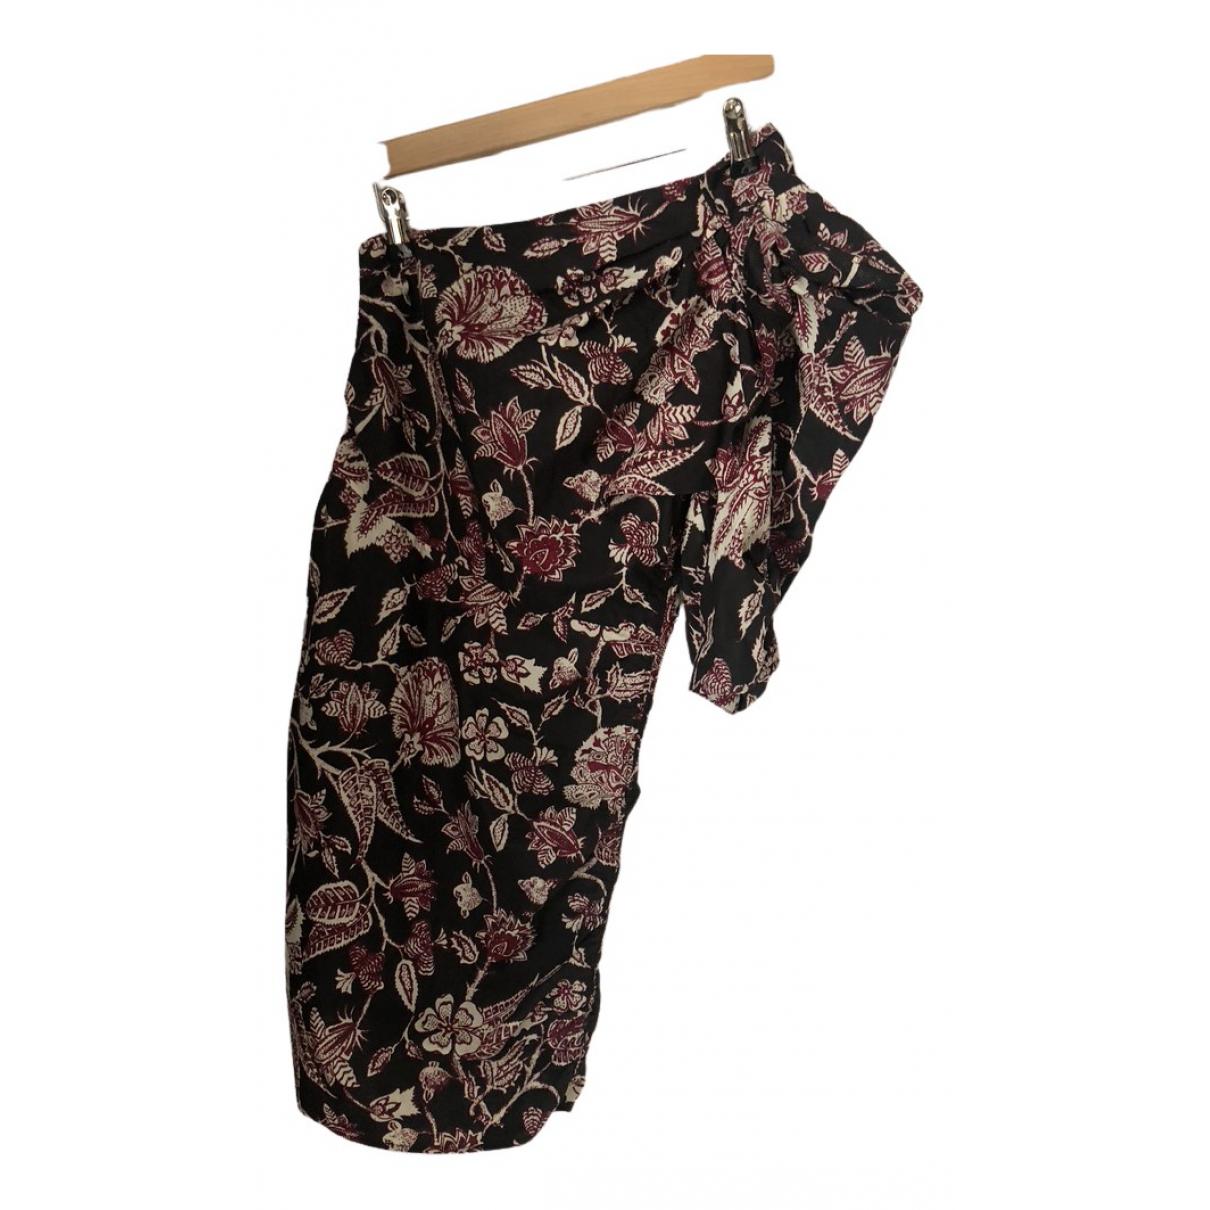 Isabel Marant N Black Cotton dress for Women 38 FR